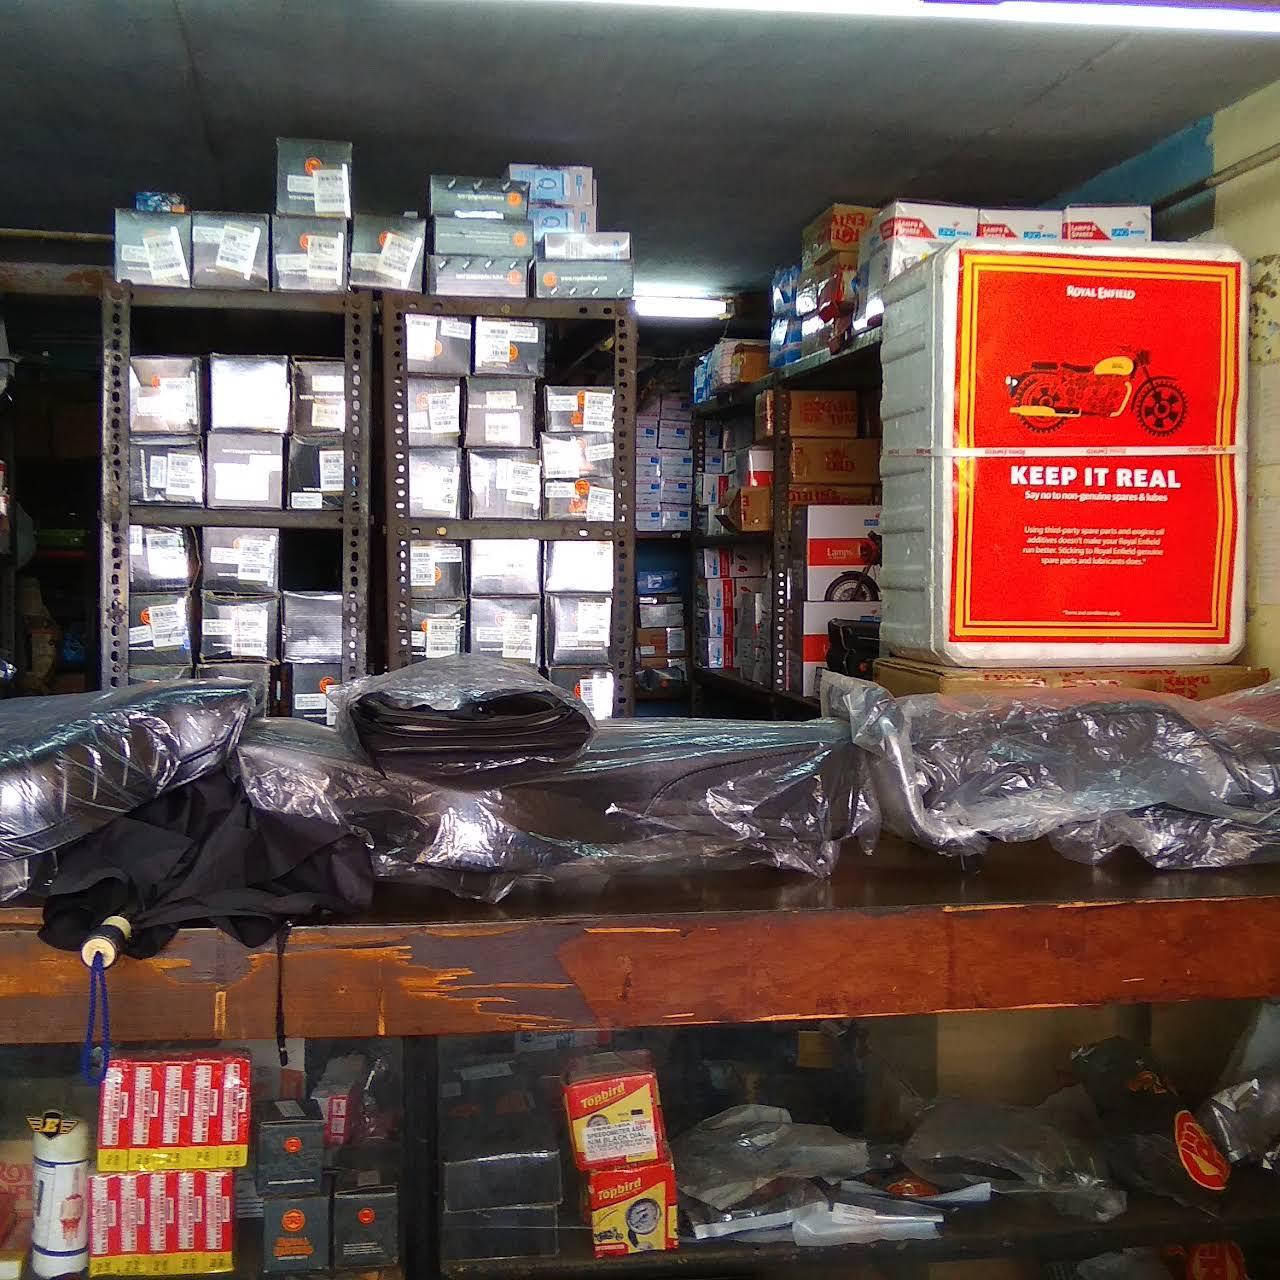 Kottayam Motor Parts & Accessories - Royal Enfield spare